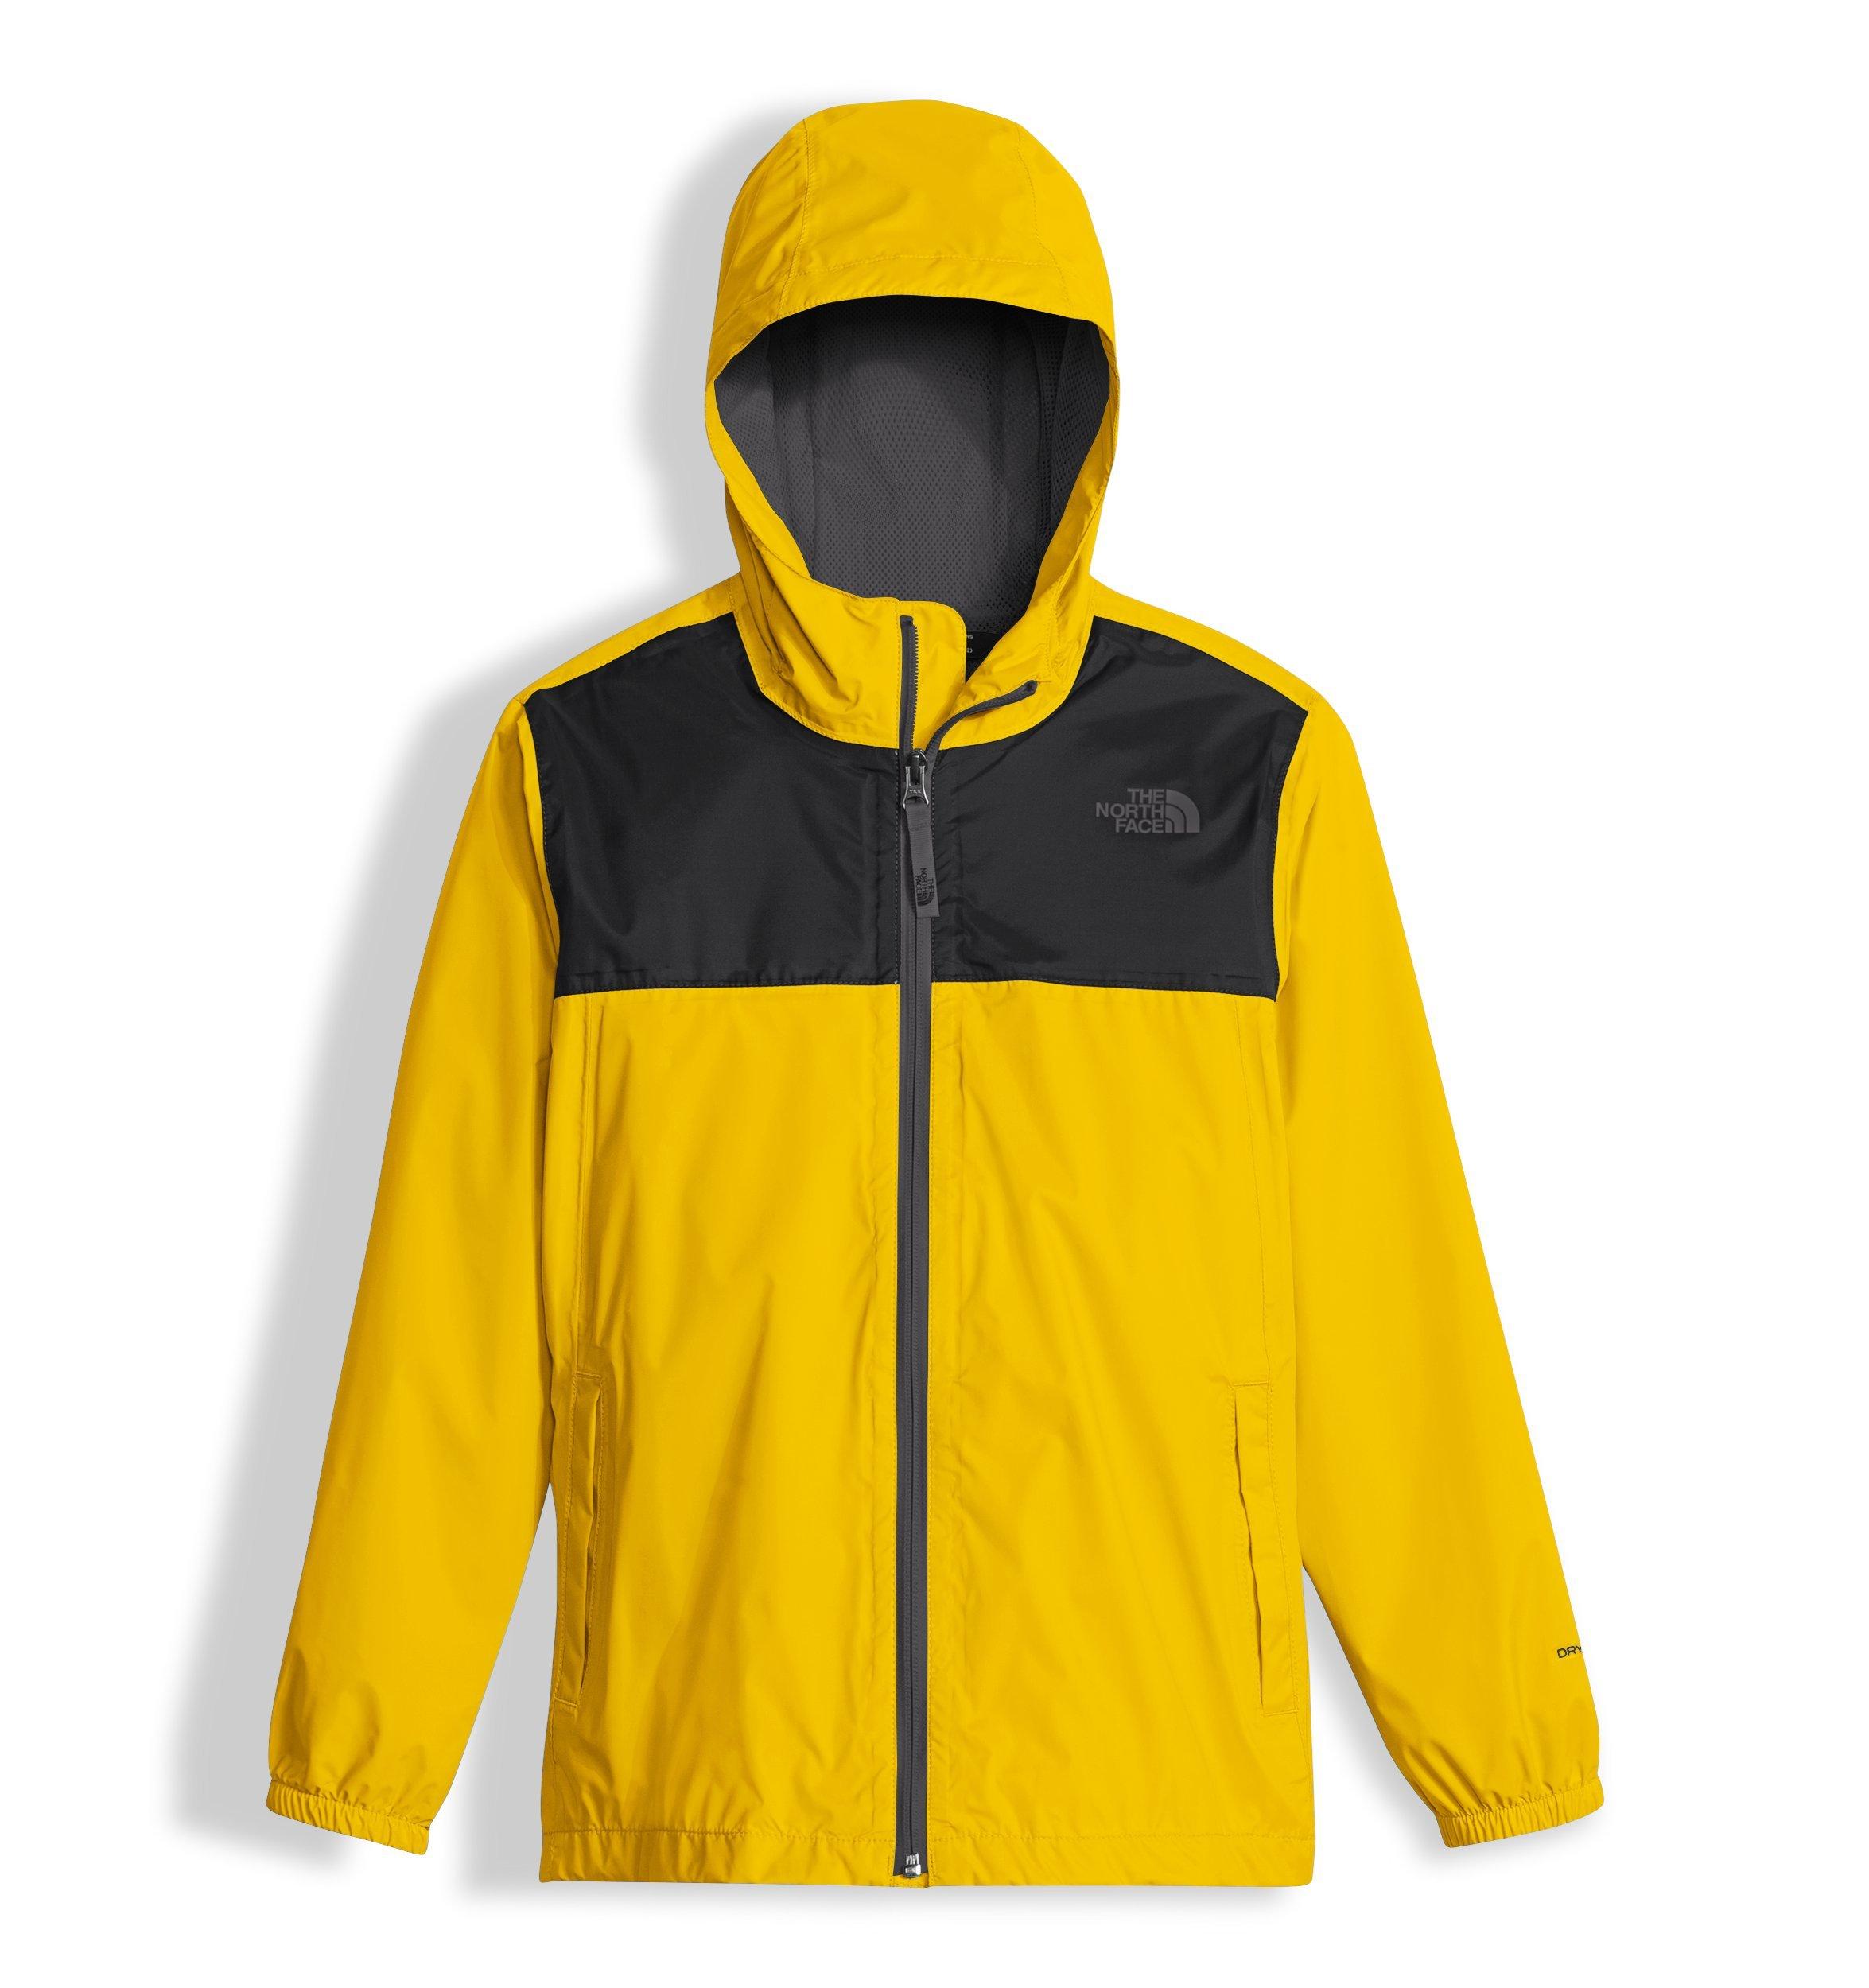 e01f27c42d69 Galleon - The North Face Boy s Zipline Rain Jacket - Canary Yellow - XXS